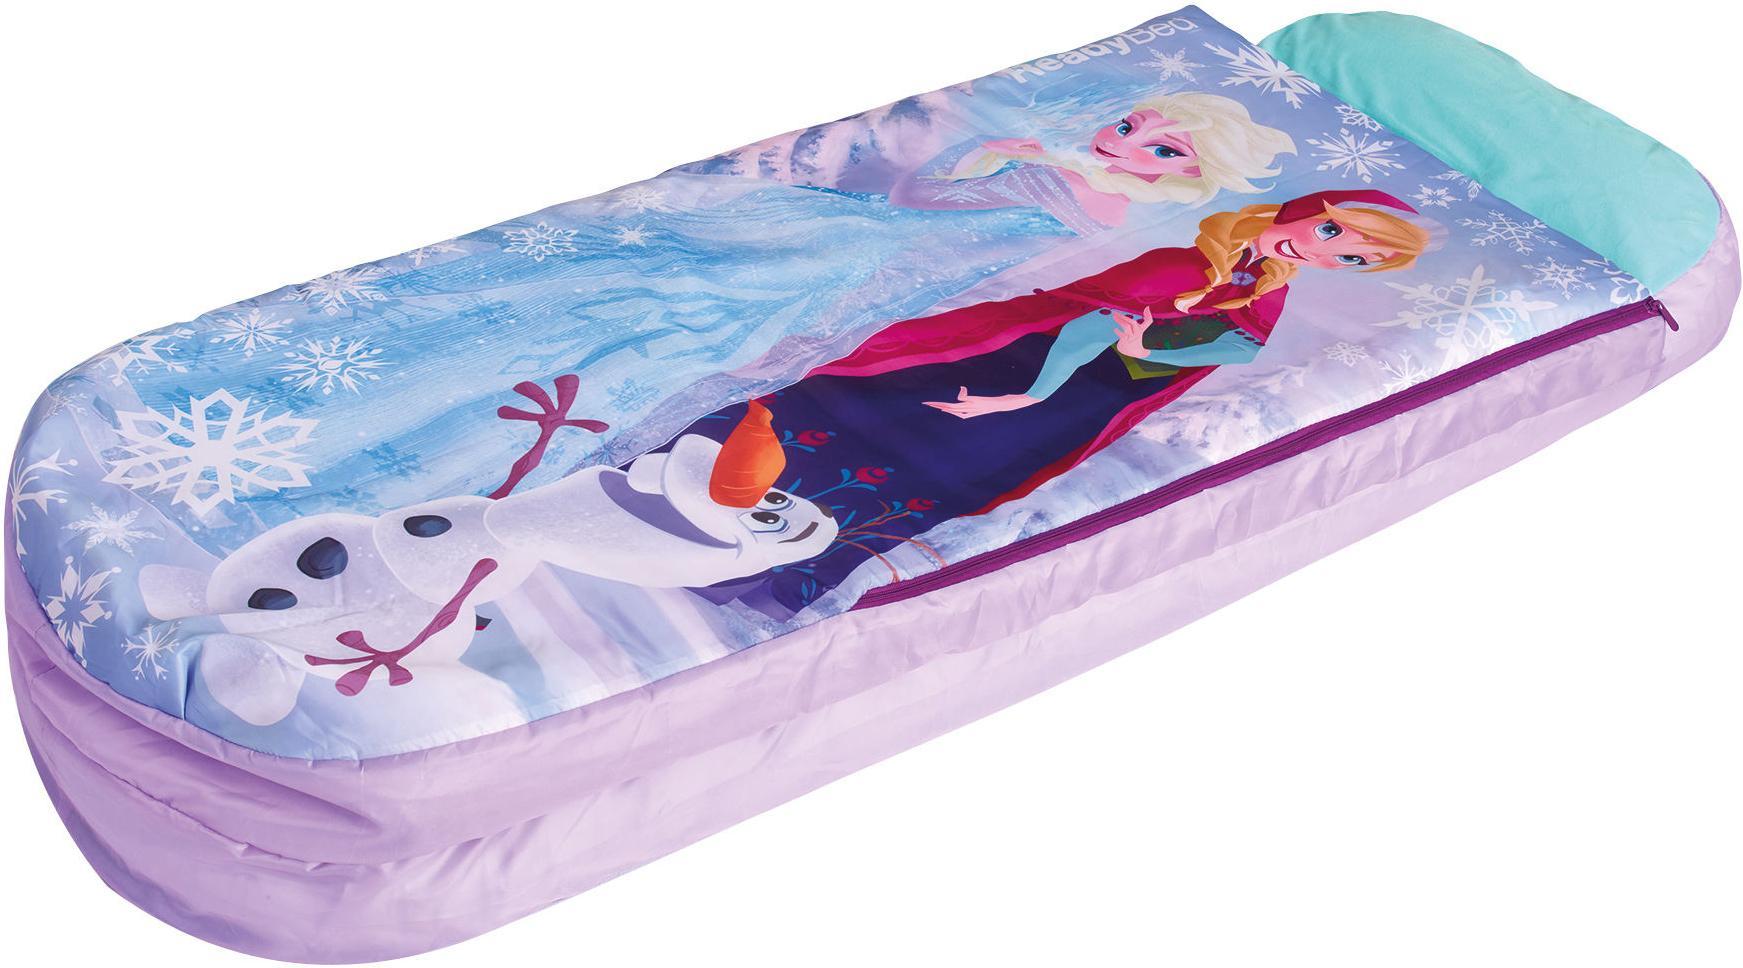 Kids Child Junior Girls Camping Sleepover Airbed Sleeping Bag Ready Bed Frozen